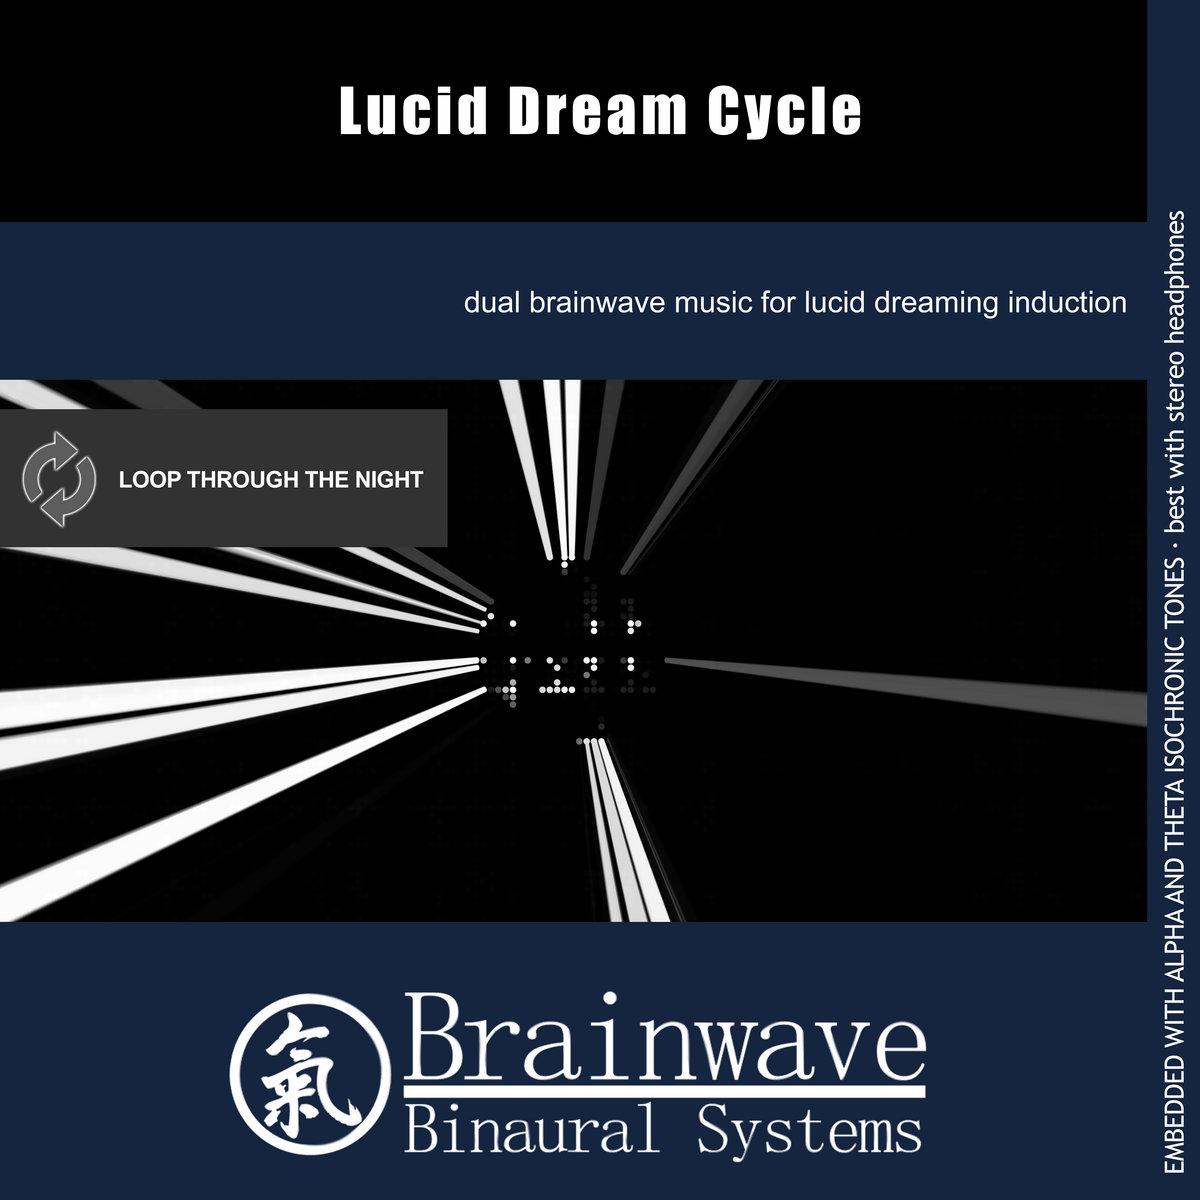 Lucid Dream Cycle | Brainwave Binaural Systems